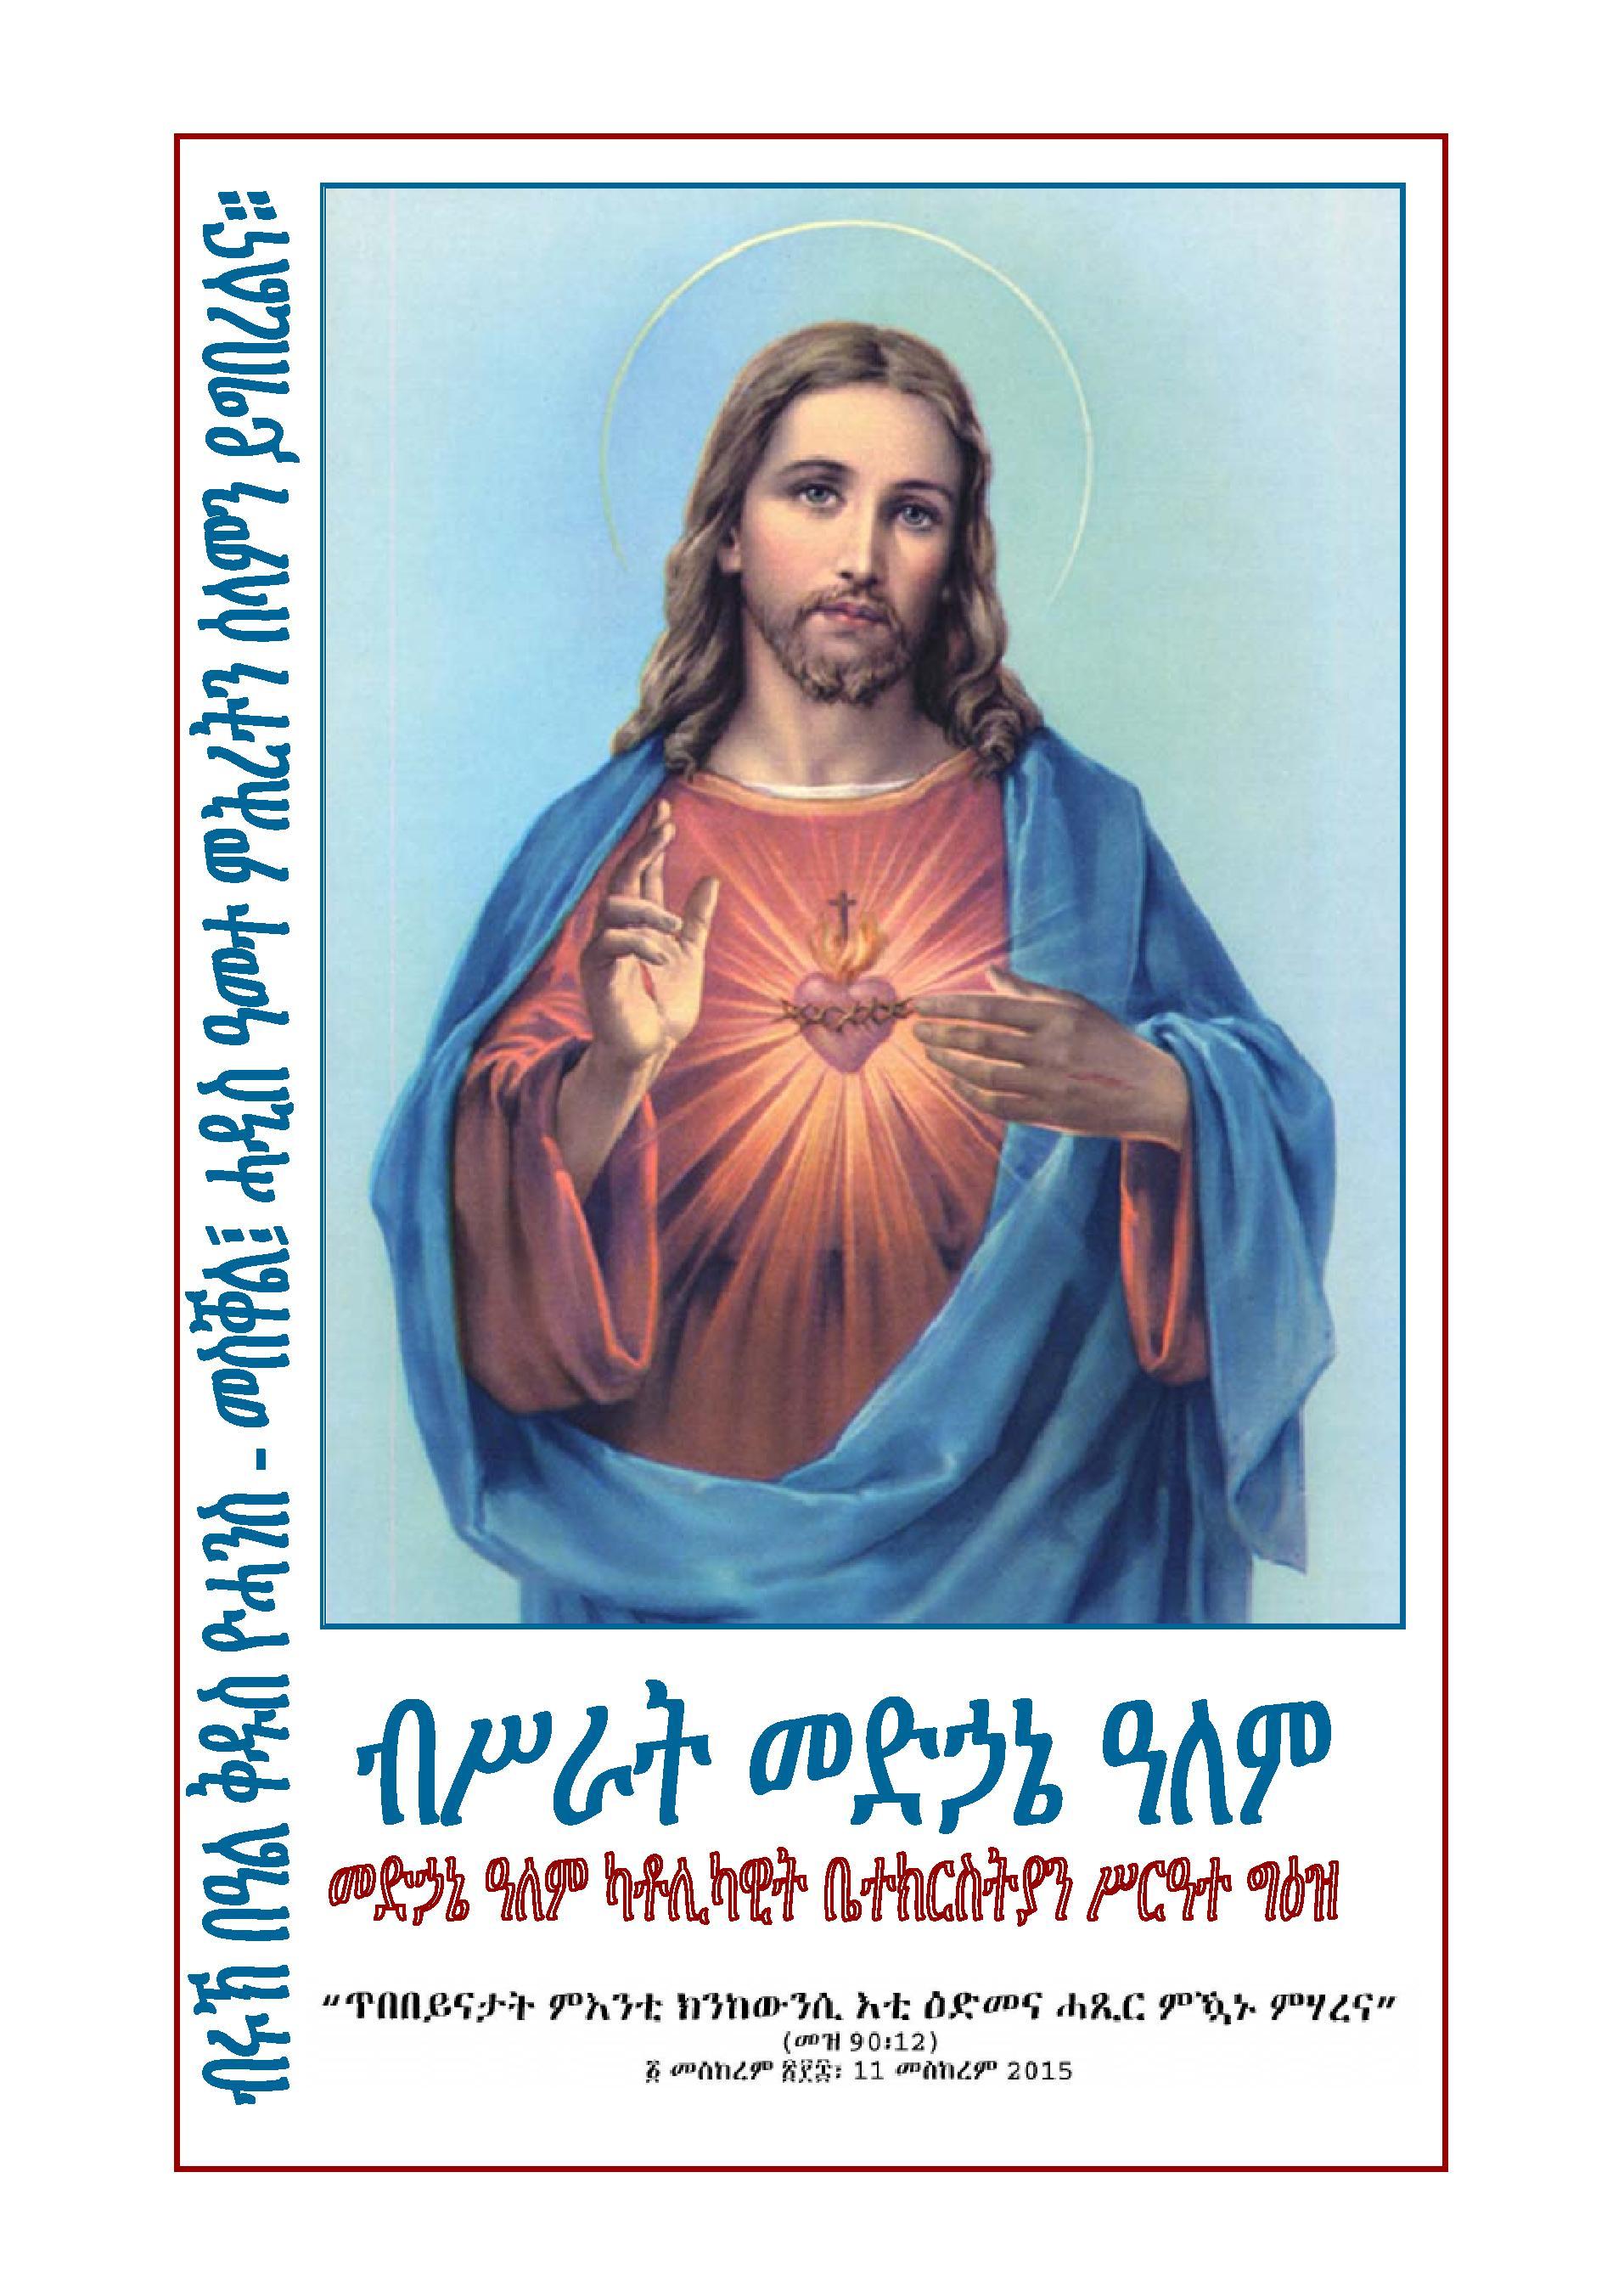 Semptember - Medhanie Alem Megazine e-format-page-001 (1)